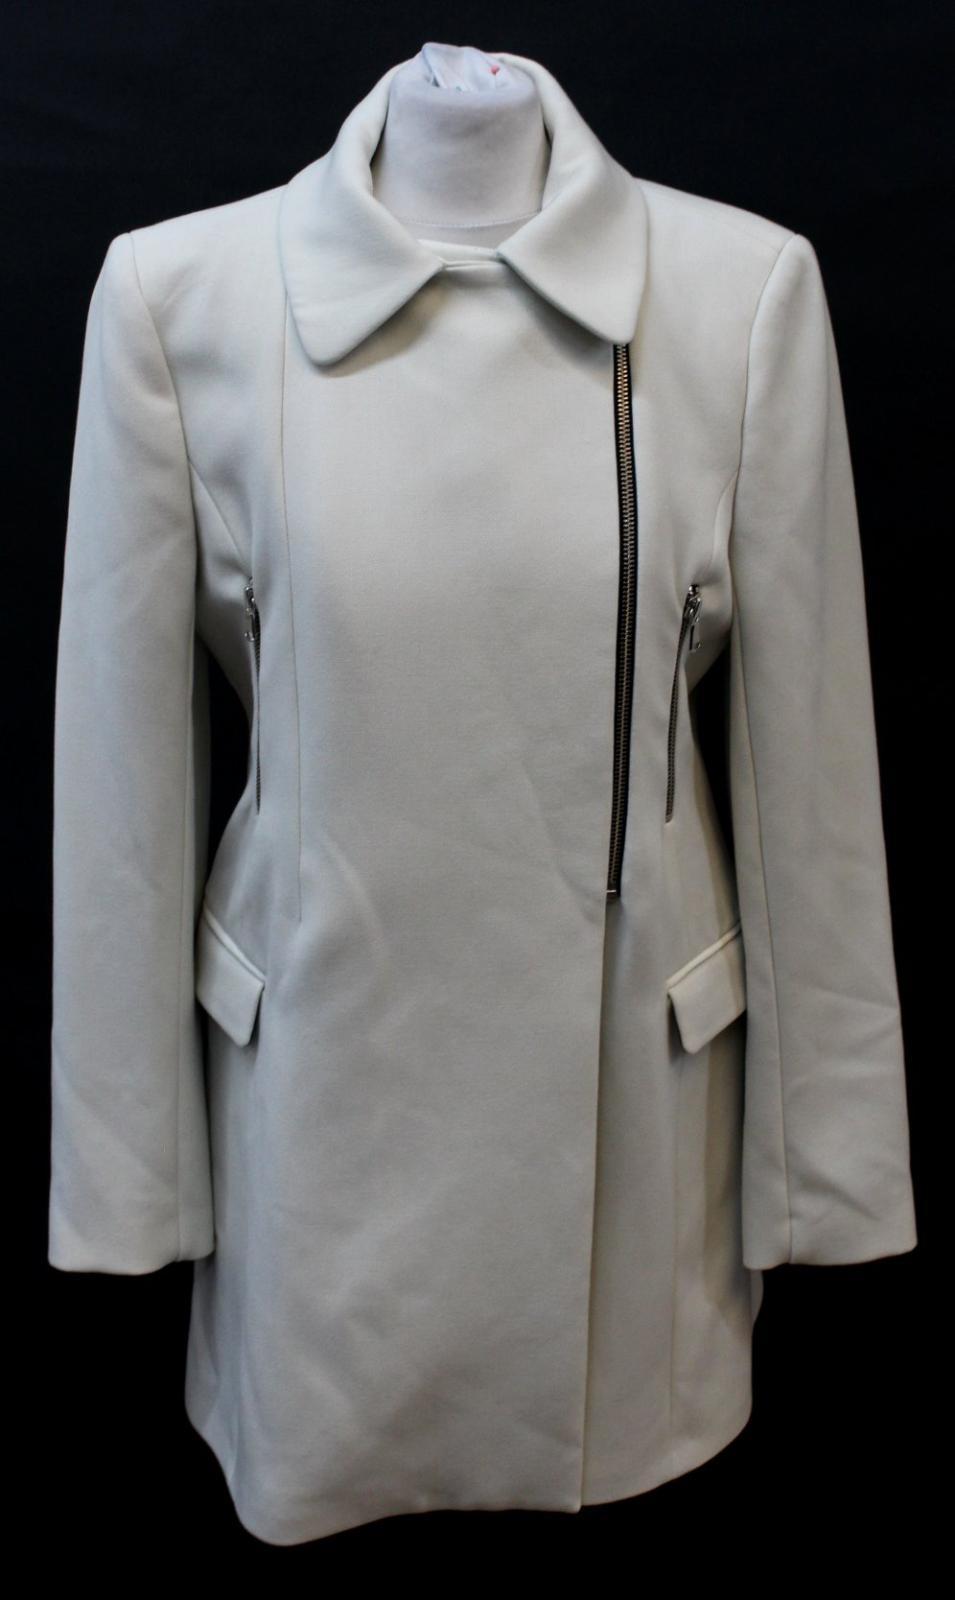 8f99b0c7 ZARA WOMAN Ladies Ivory Asymmetric Zip Collared Neckline Trench Coat ...